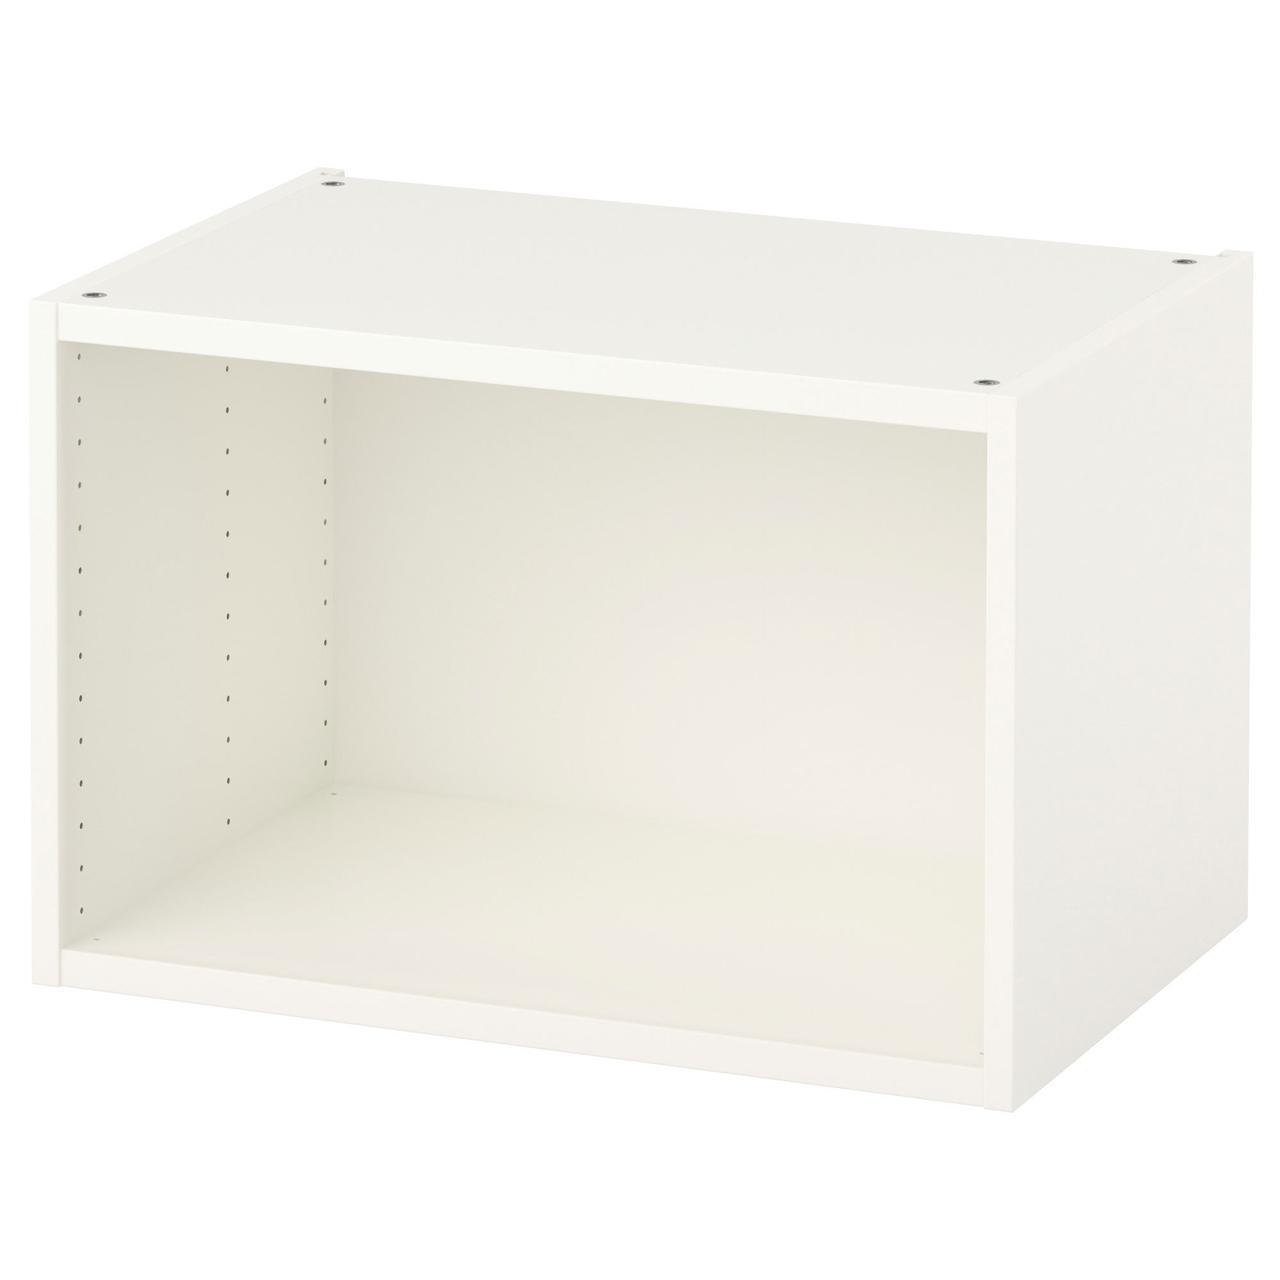 Каркас IKEA PLATSA белый 60x40x40 см 703.309.50